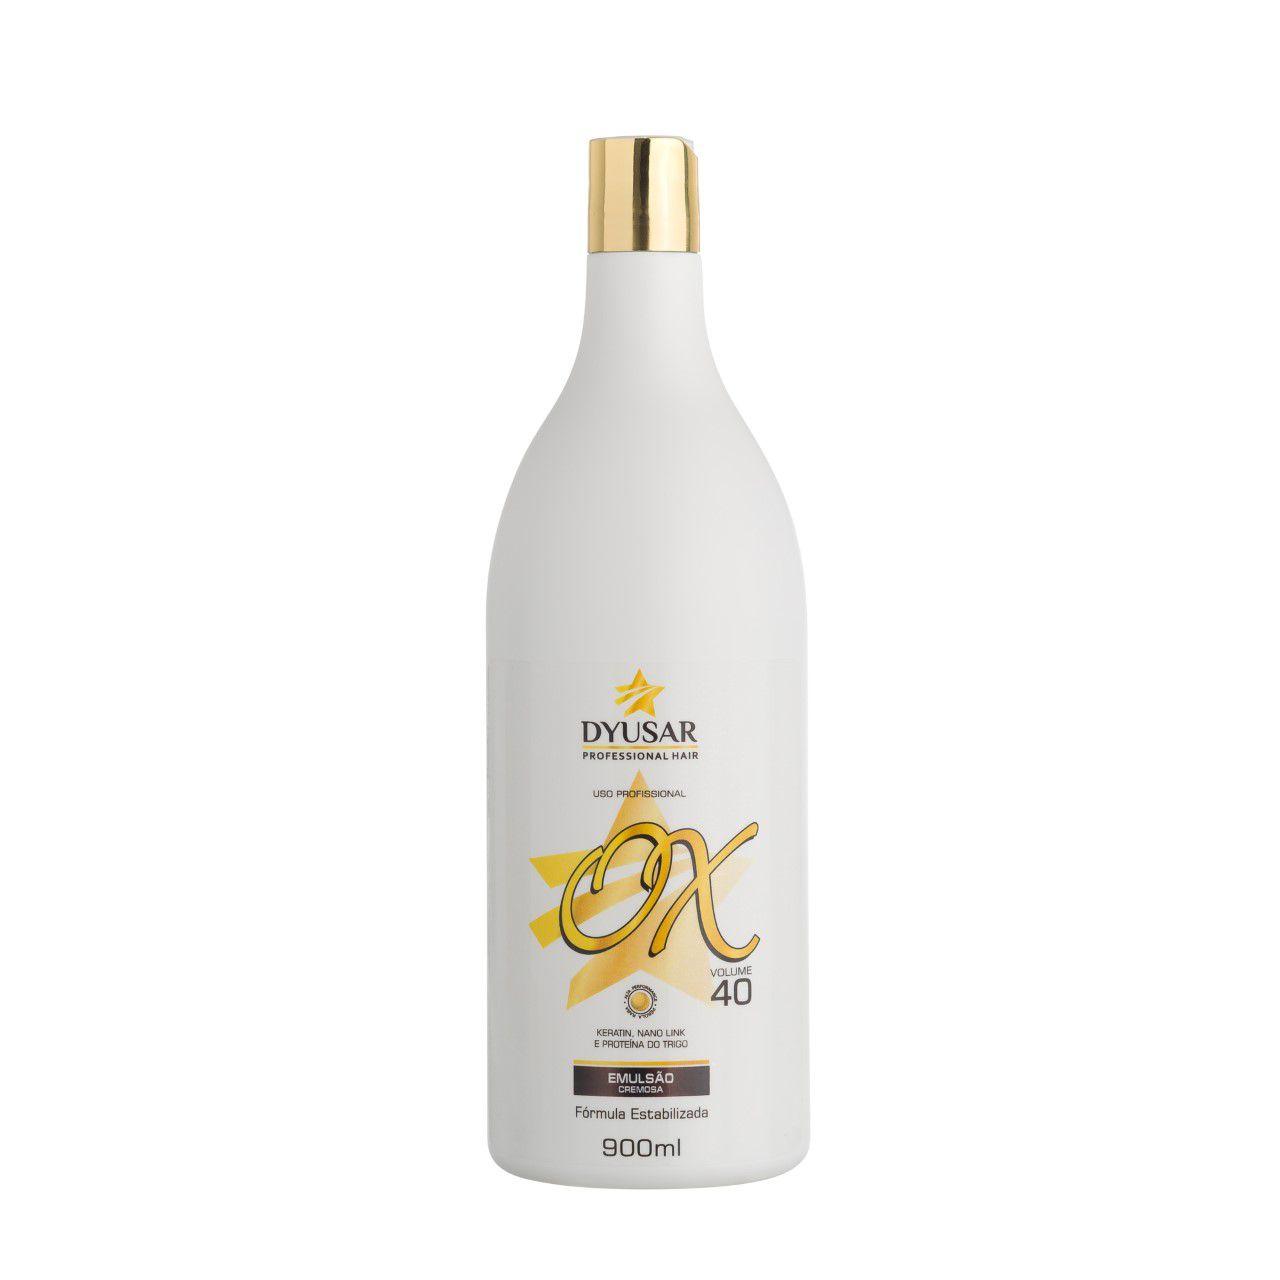 Oxidante Estabilizada - 40 Vol. DYUSAR Professional 900 ml